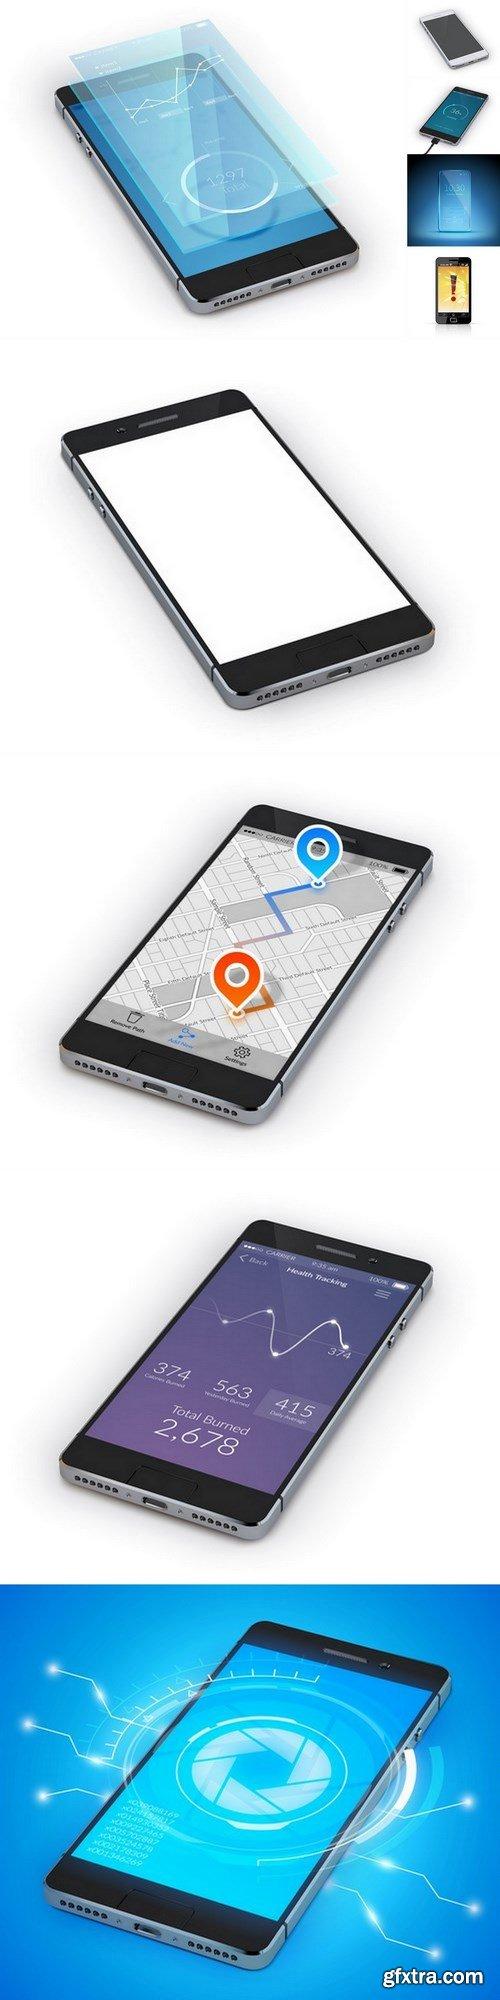 smartphone - 9 EPS Vector Stock